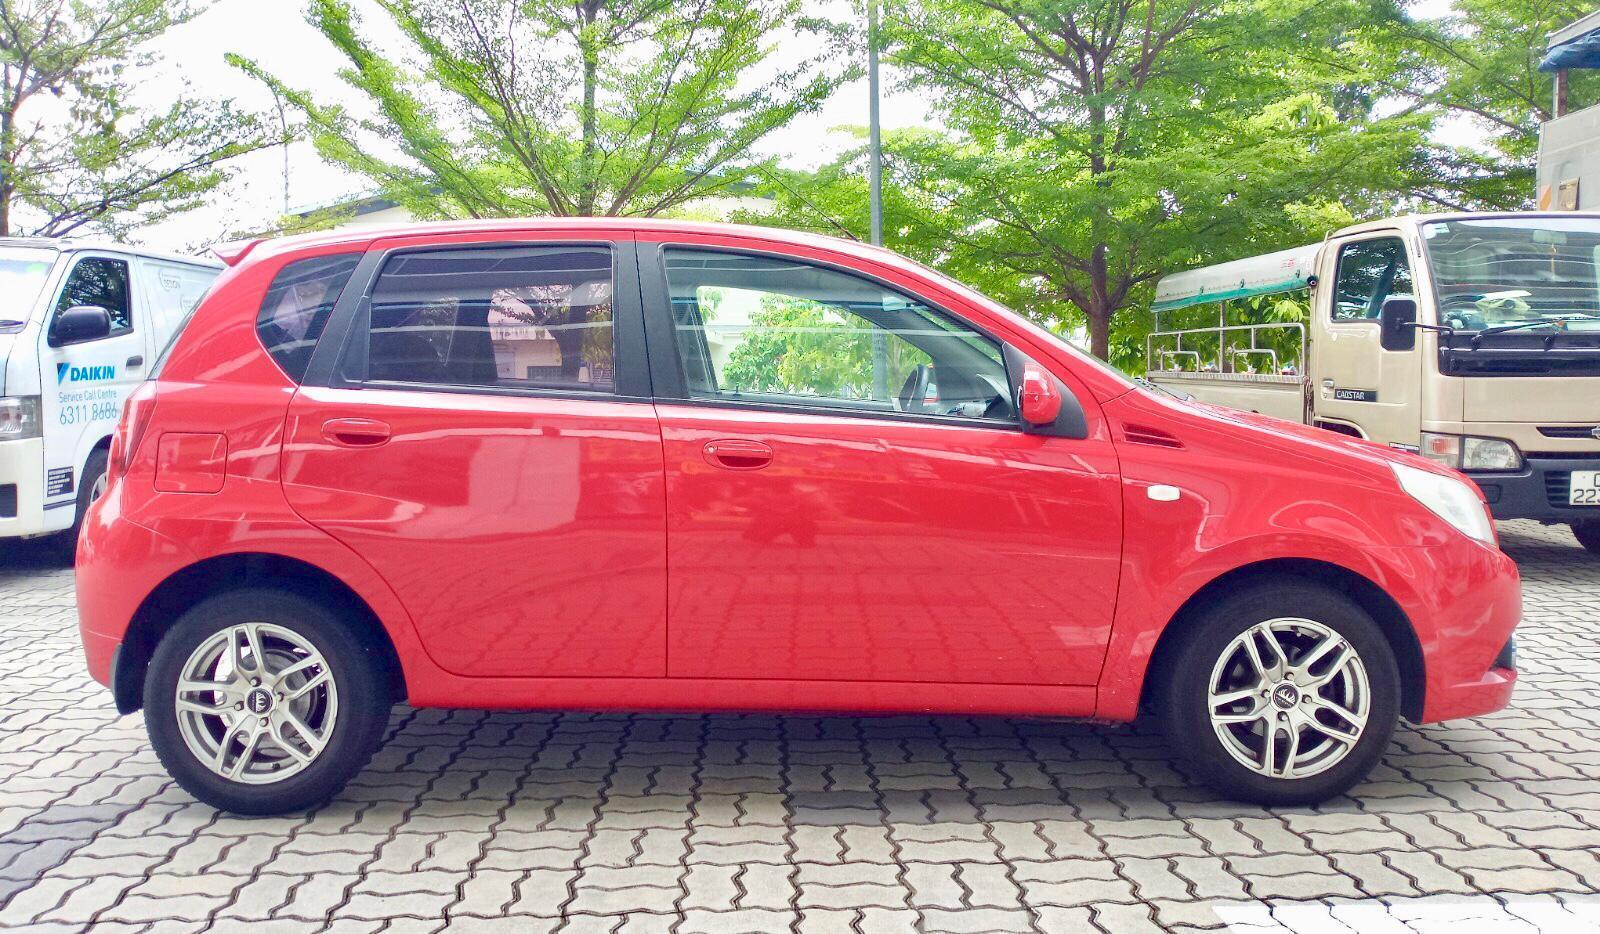 Chevrolet AVEO 1.4A hatchback Grab Gojek Ryde Tada & Non PHV Car Rental Services in Singapore!